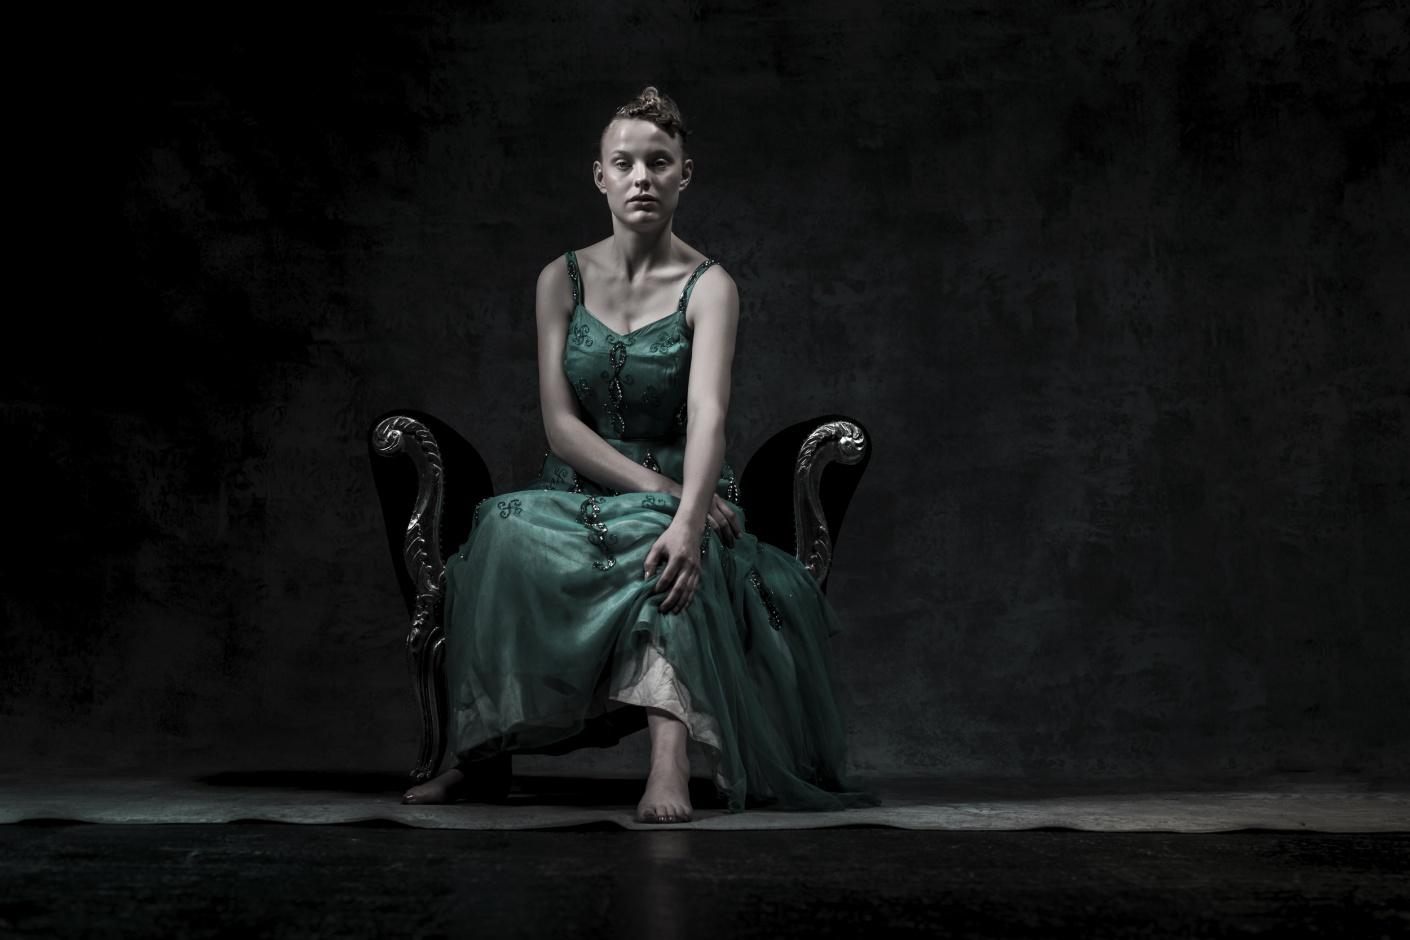 Maureen Stieltjes Jelle Pieter de Boer Photography